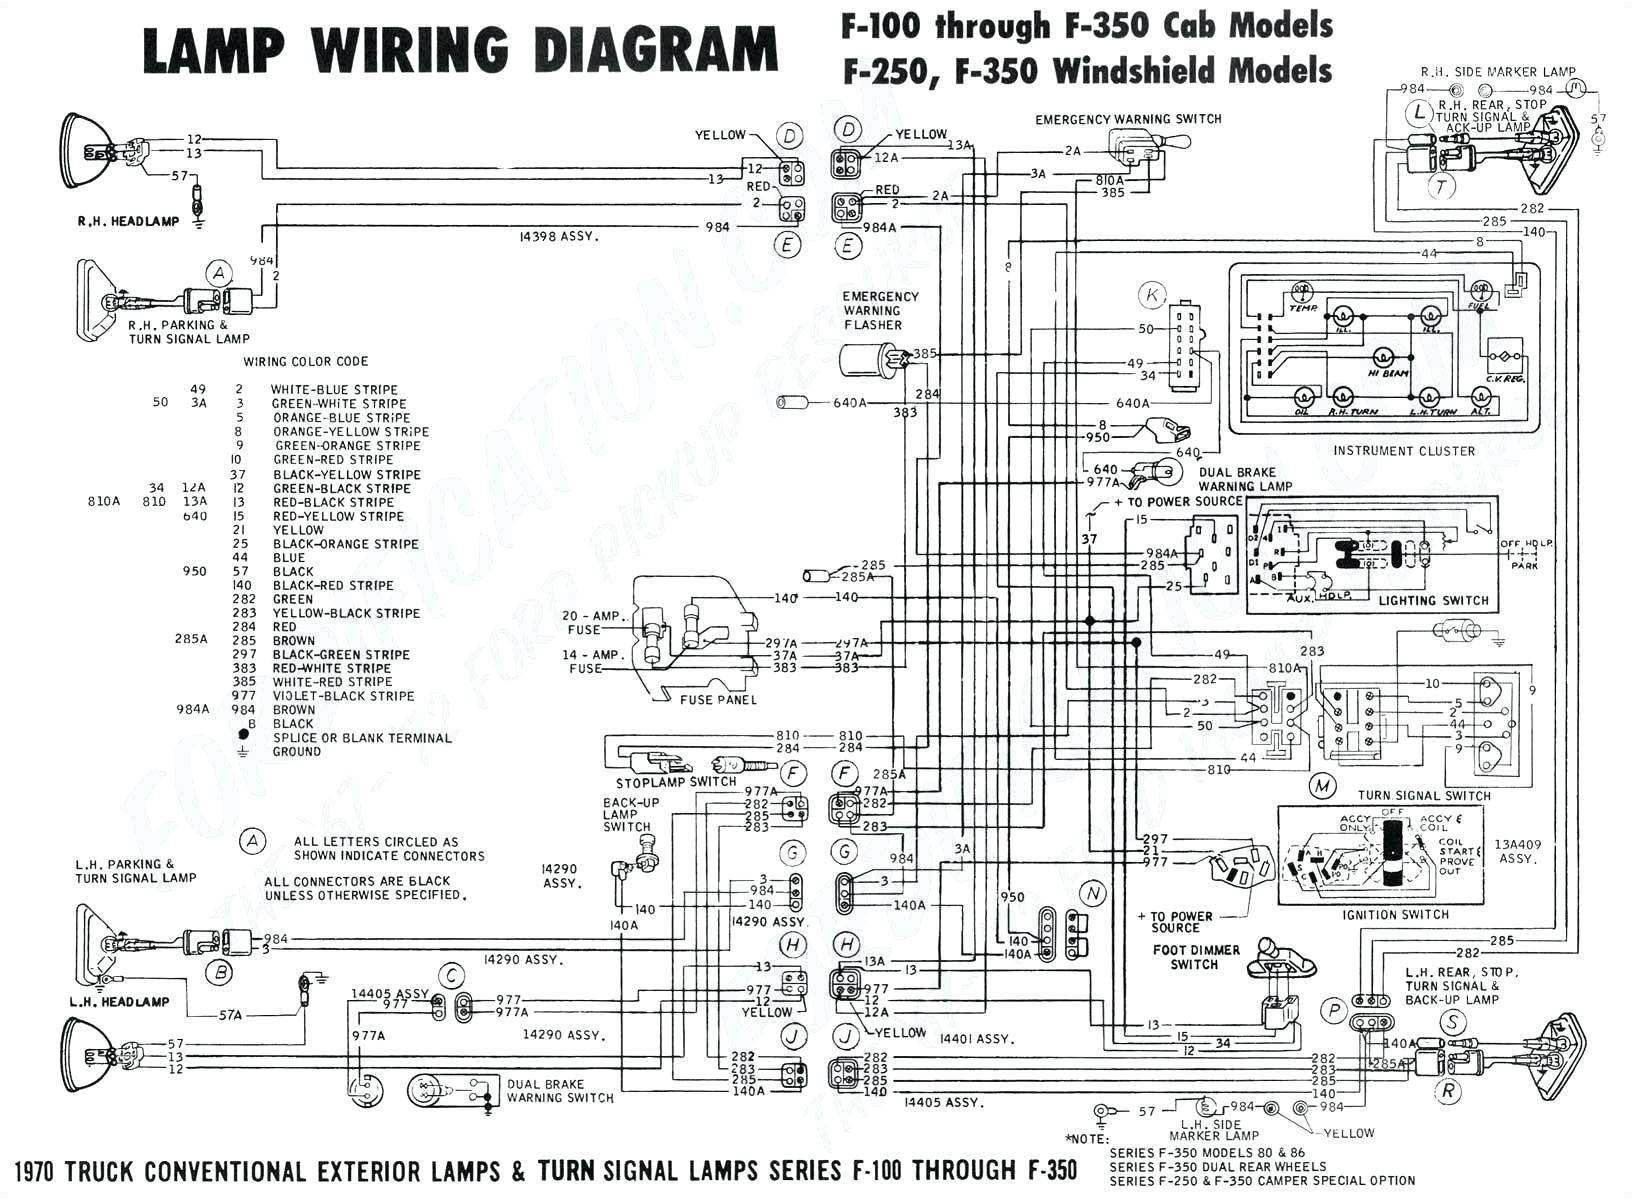 1990 toyota corolla wiring diagram wiring diagram databasetoyota corolla fog light wiring diagram